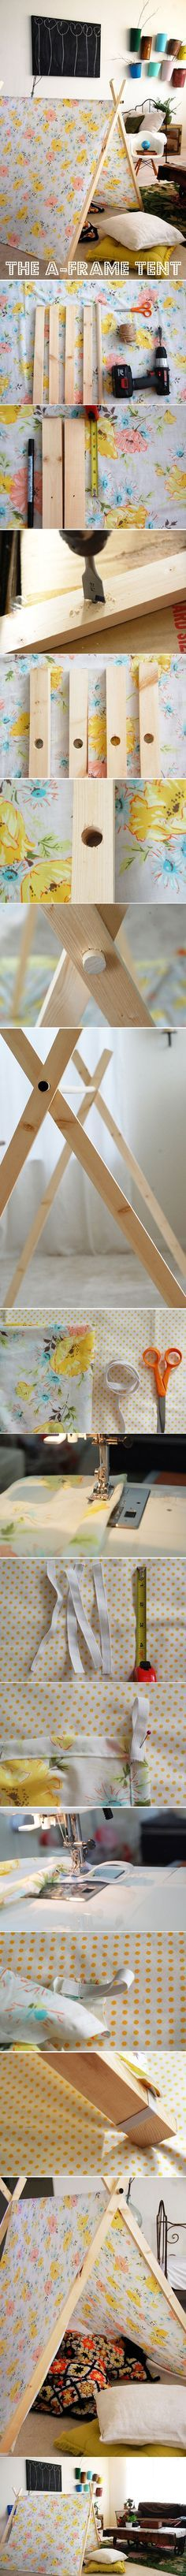 DIY Tutorial A Frame Tent great idea instead